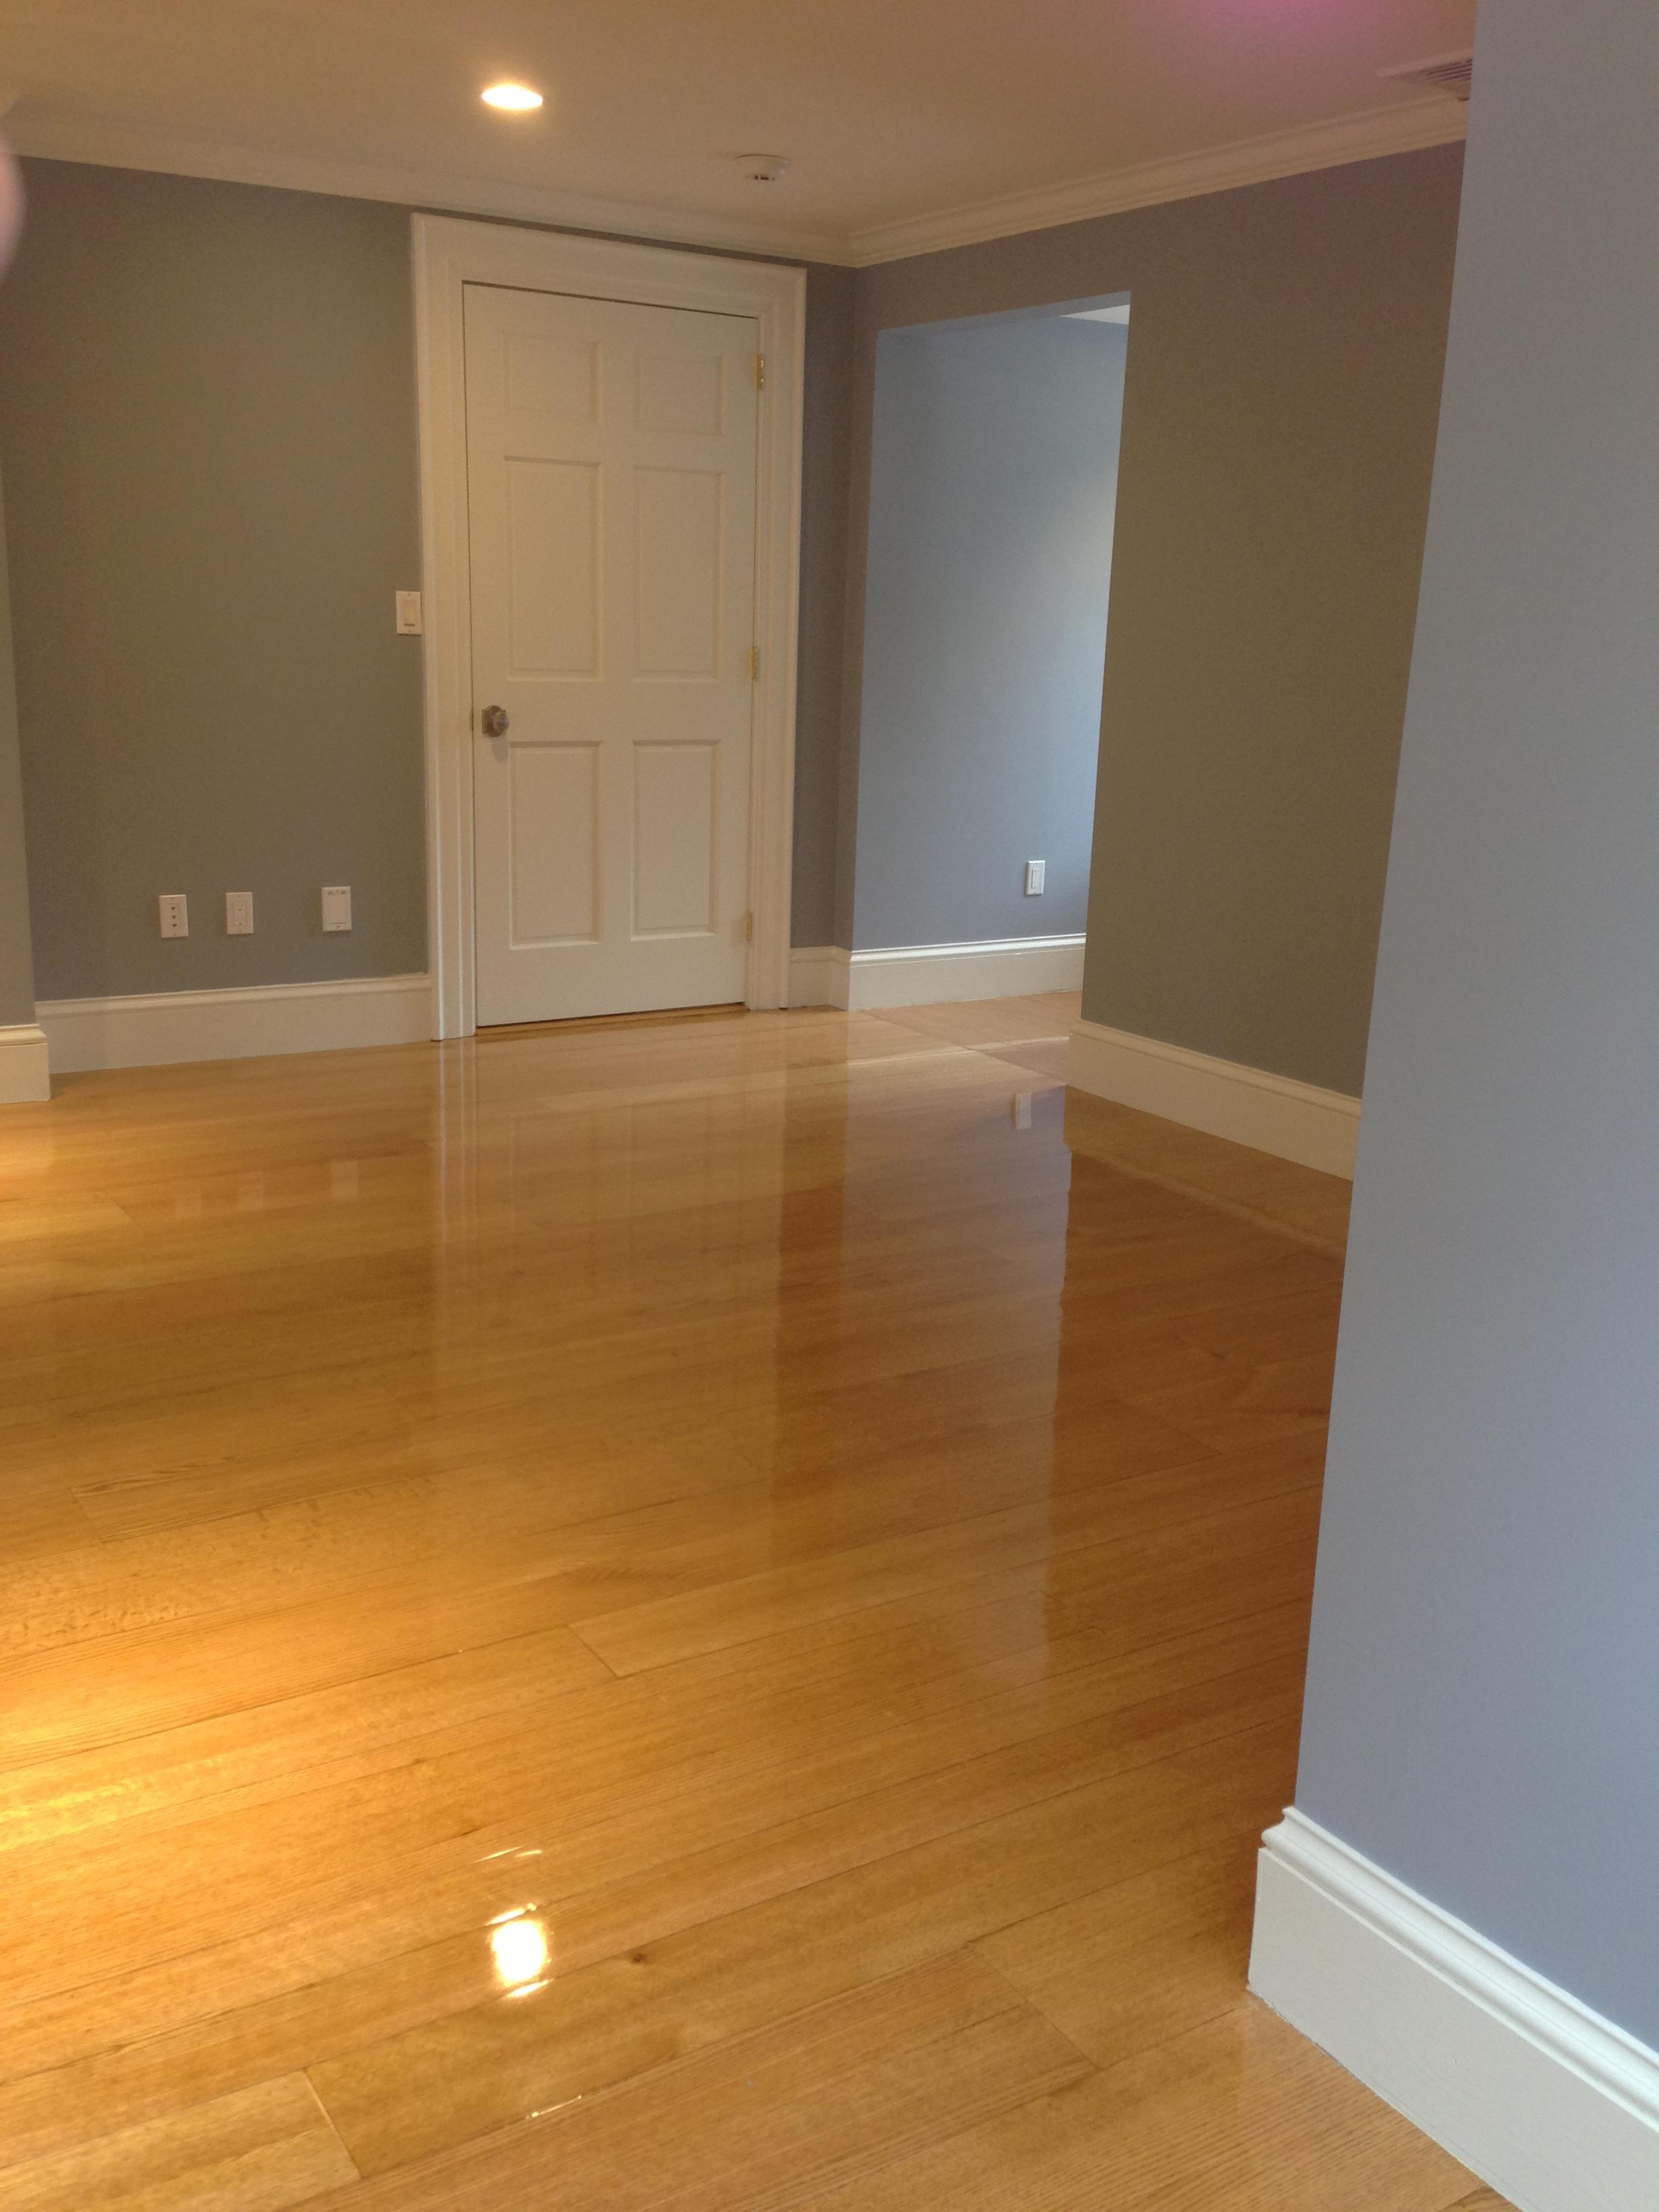 Quarter- and rift-sawn wide plank sawn veneer flooring